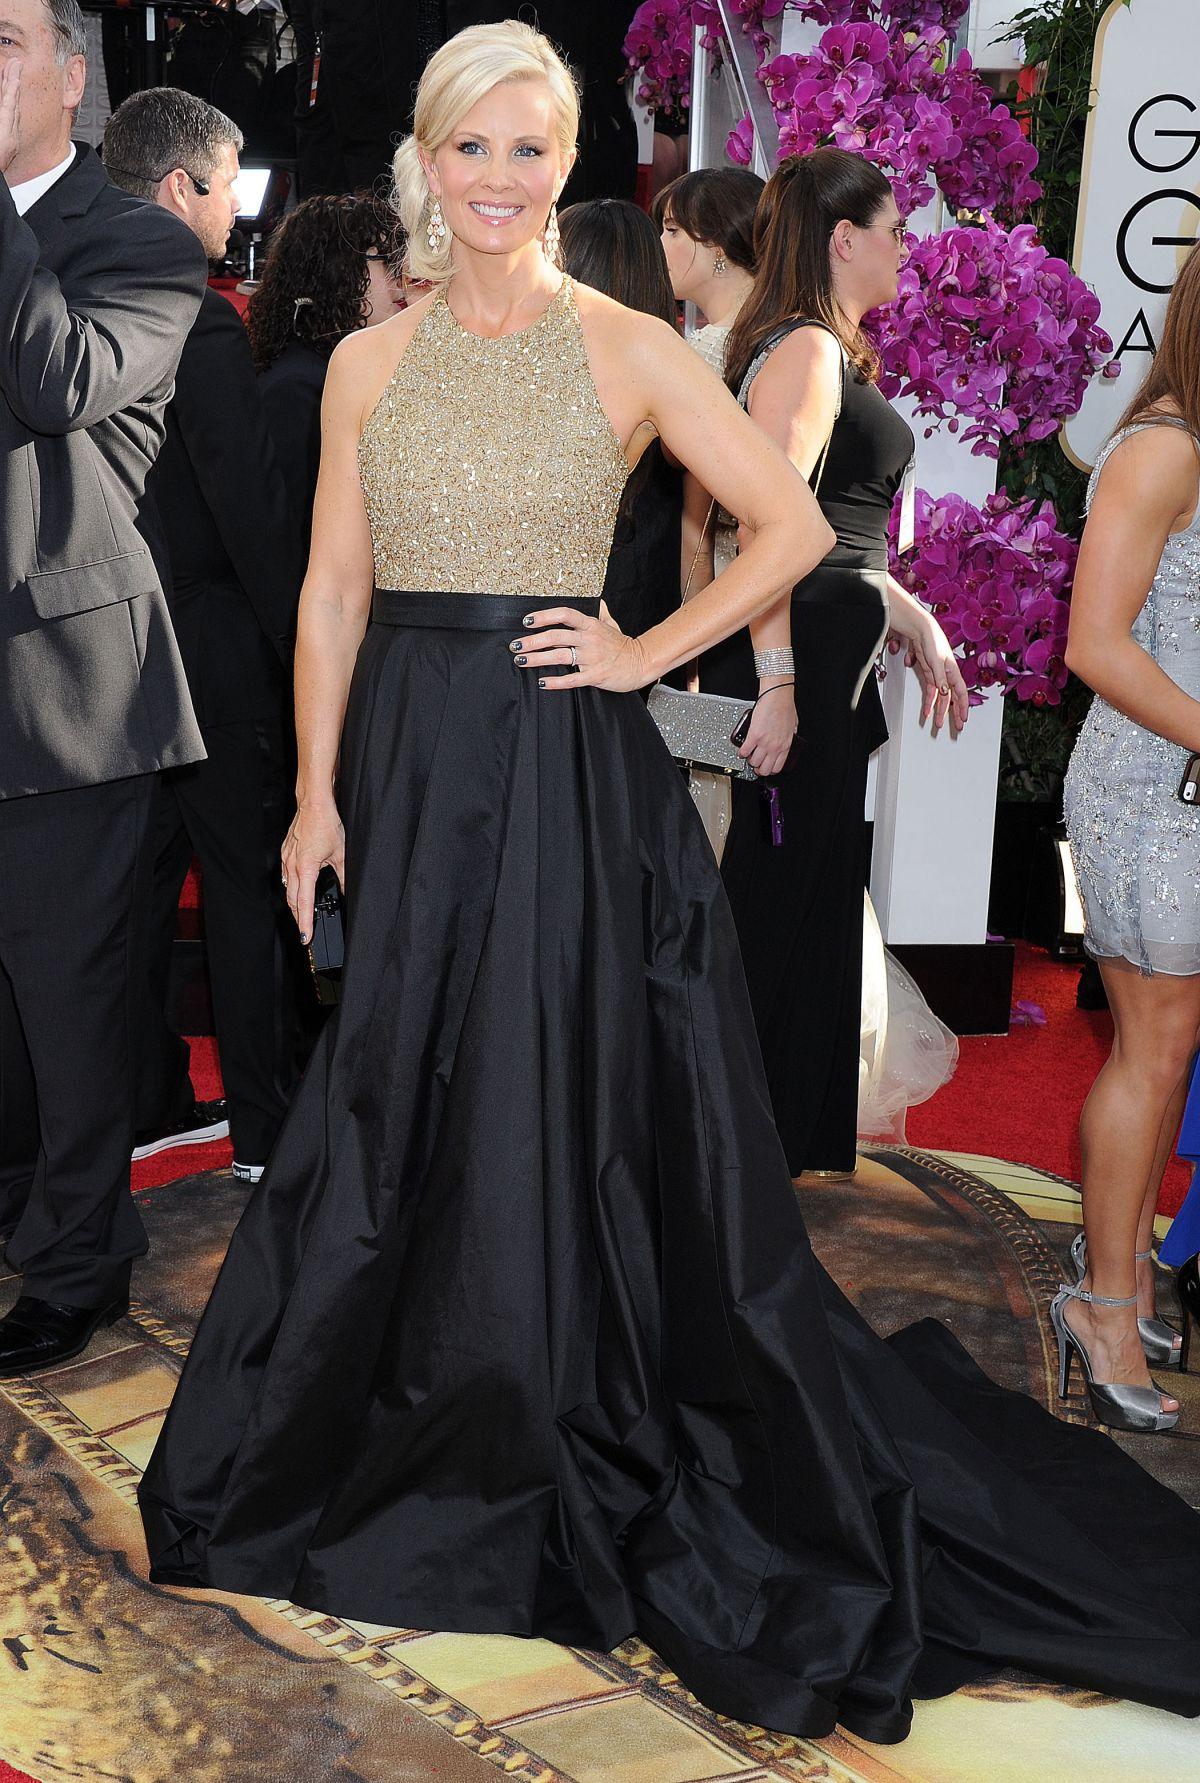 MONICA POTTER at 71st Annual Golden Globe Awards